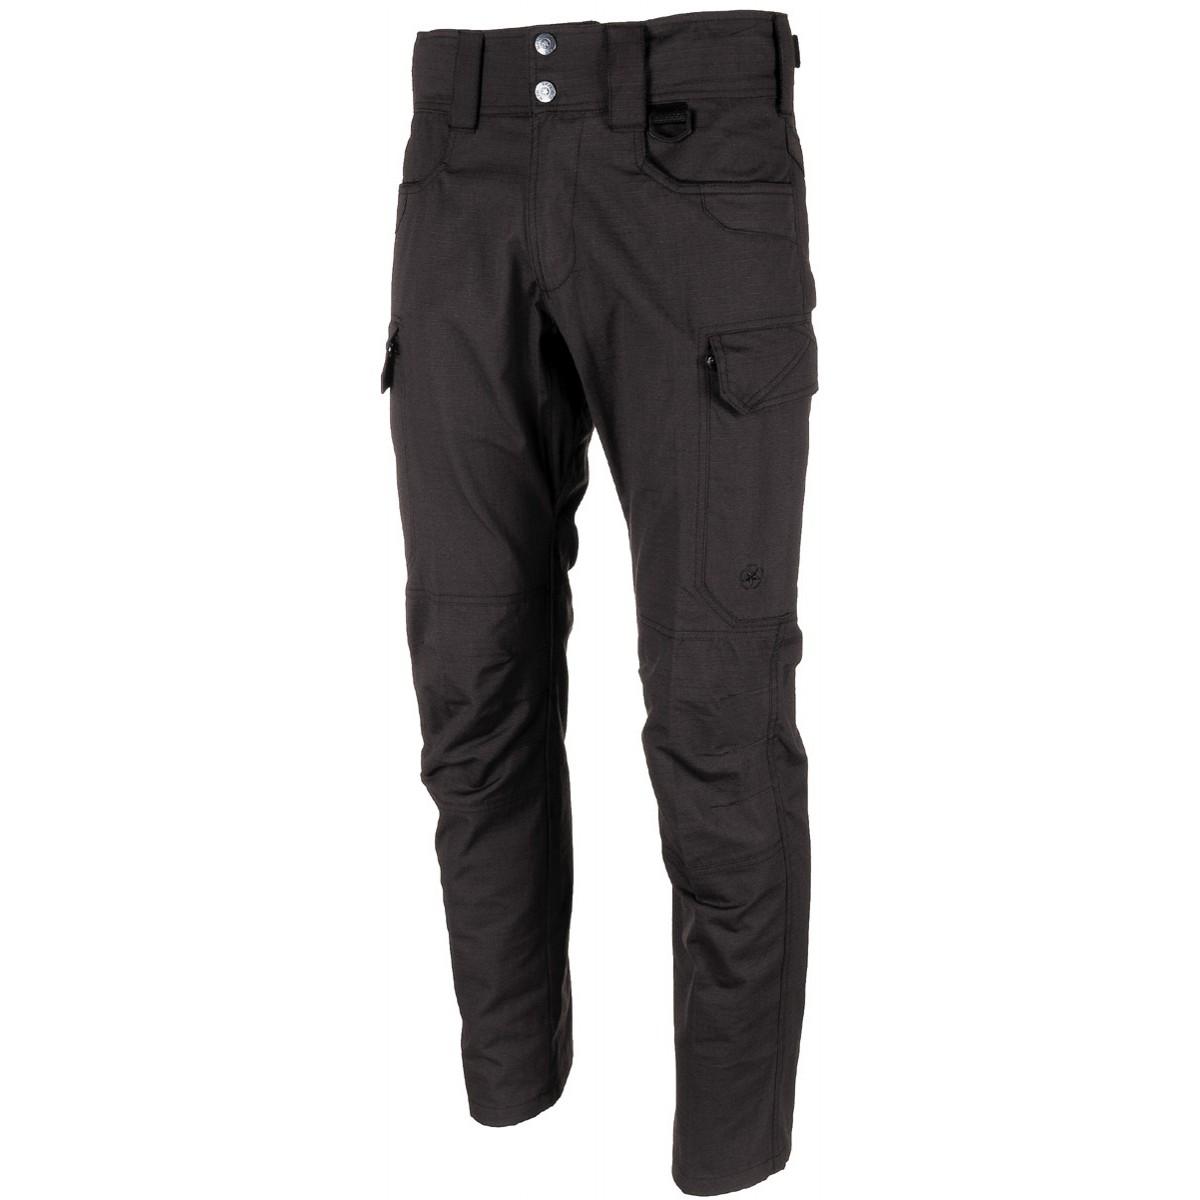 Pantalone STORM rip stop